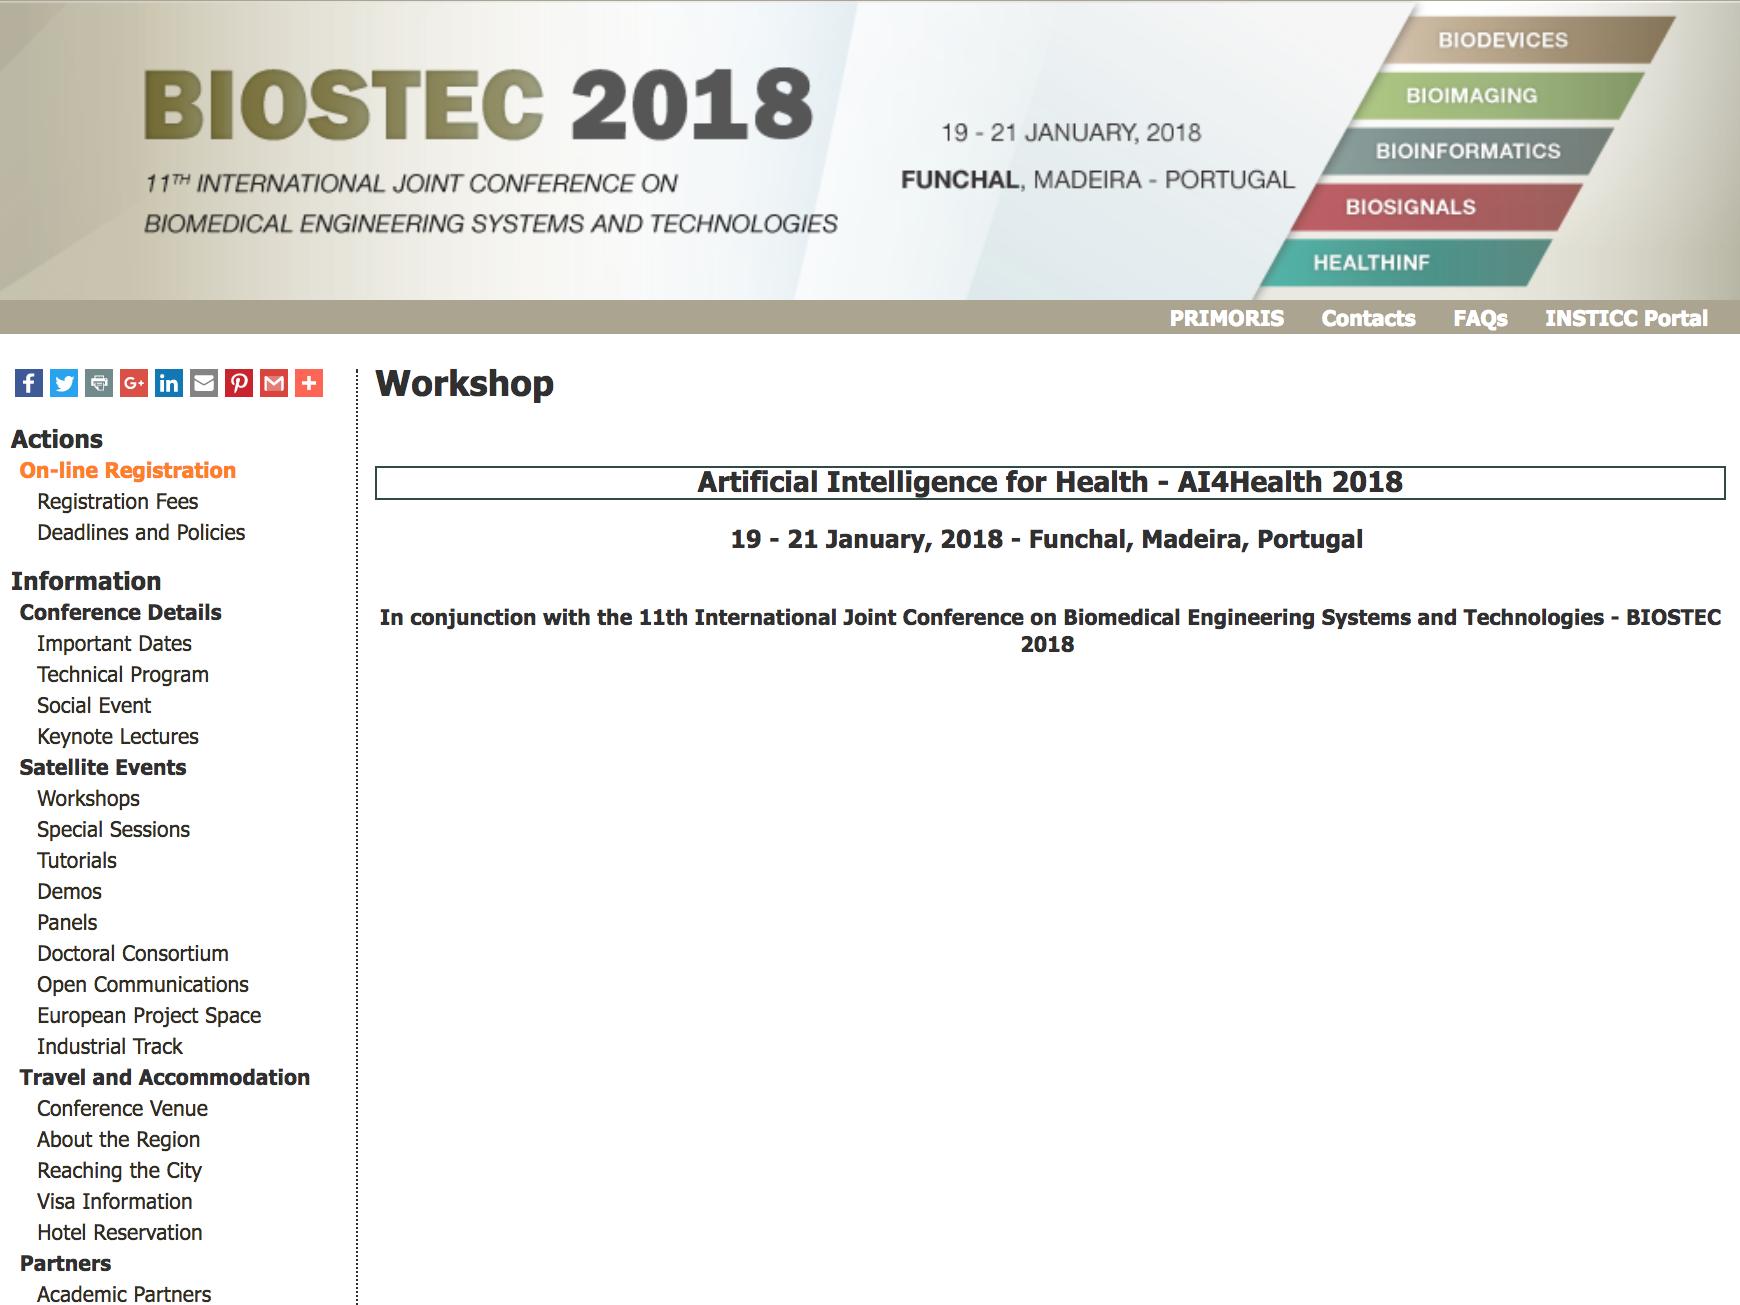 International Workshop On Artificial Intelligence For Health (AI4Health)